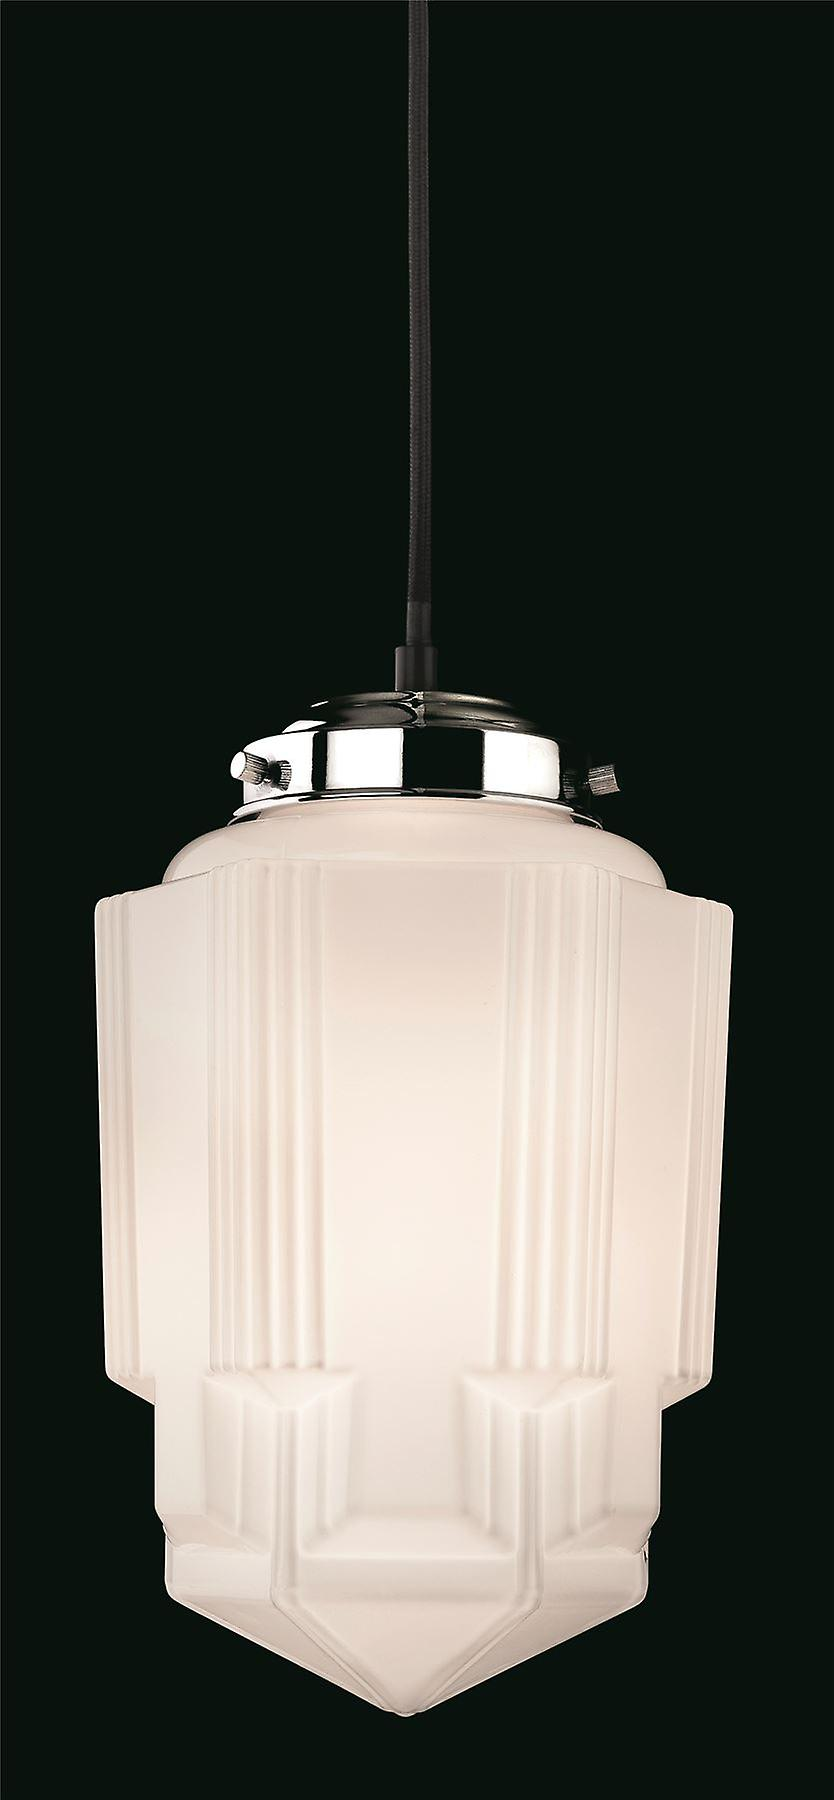 Firstlight - 1 Light Ceiling Pendant Chrome, Opal blanc Glass - 4949CH